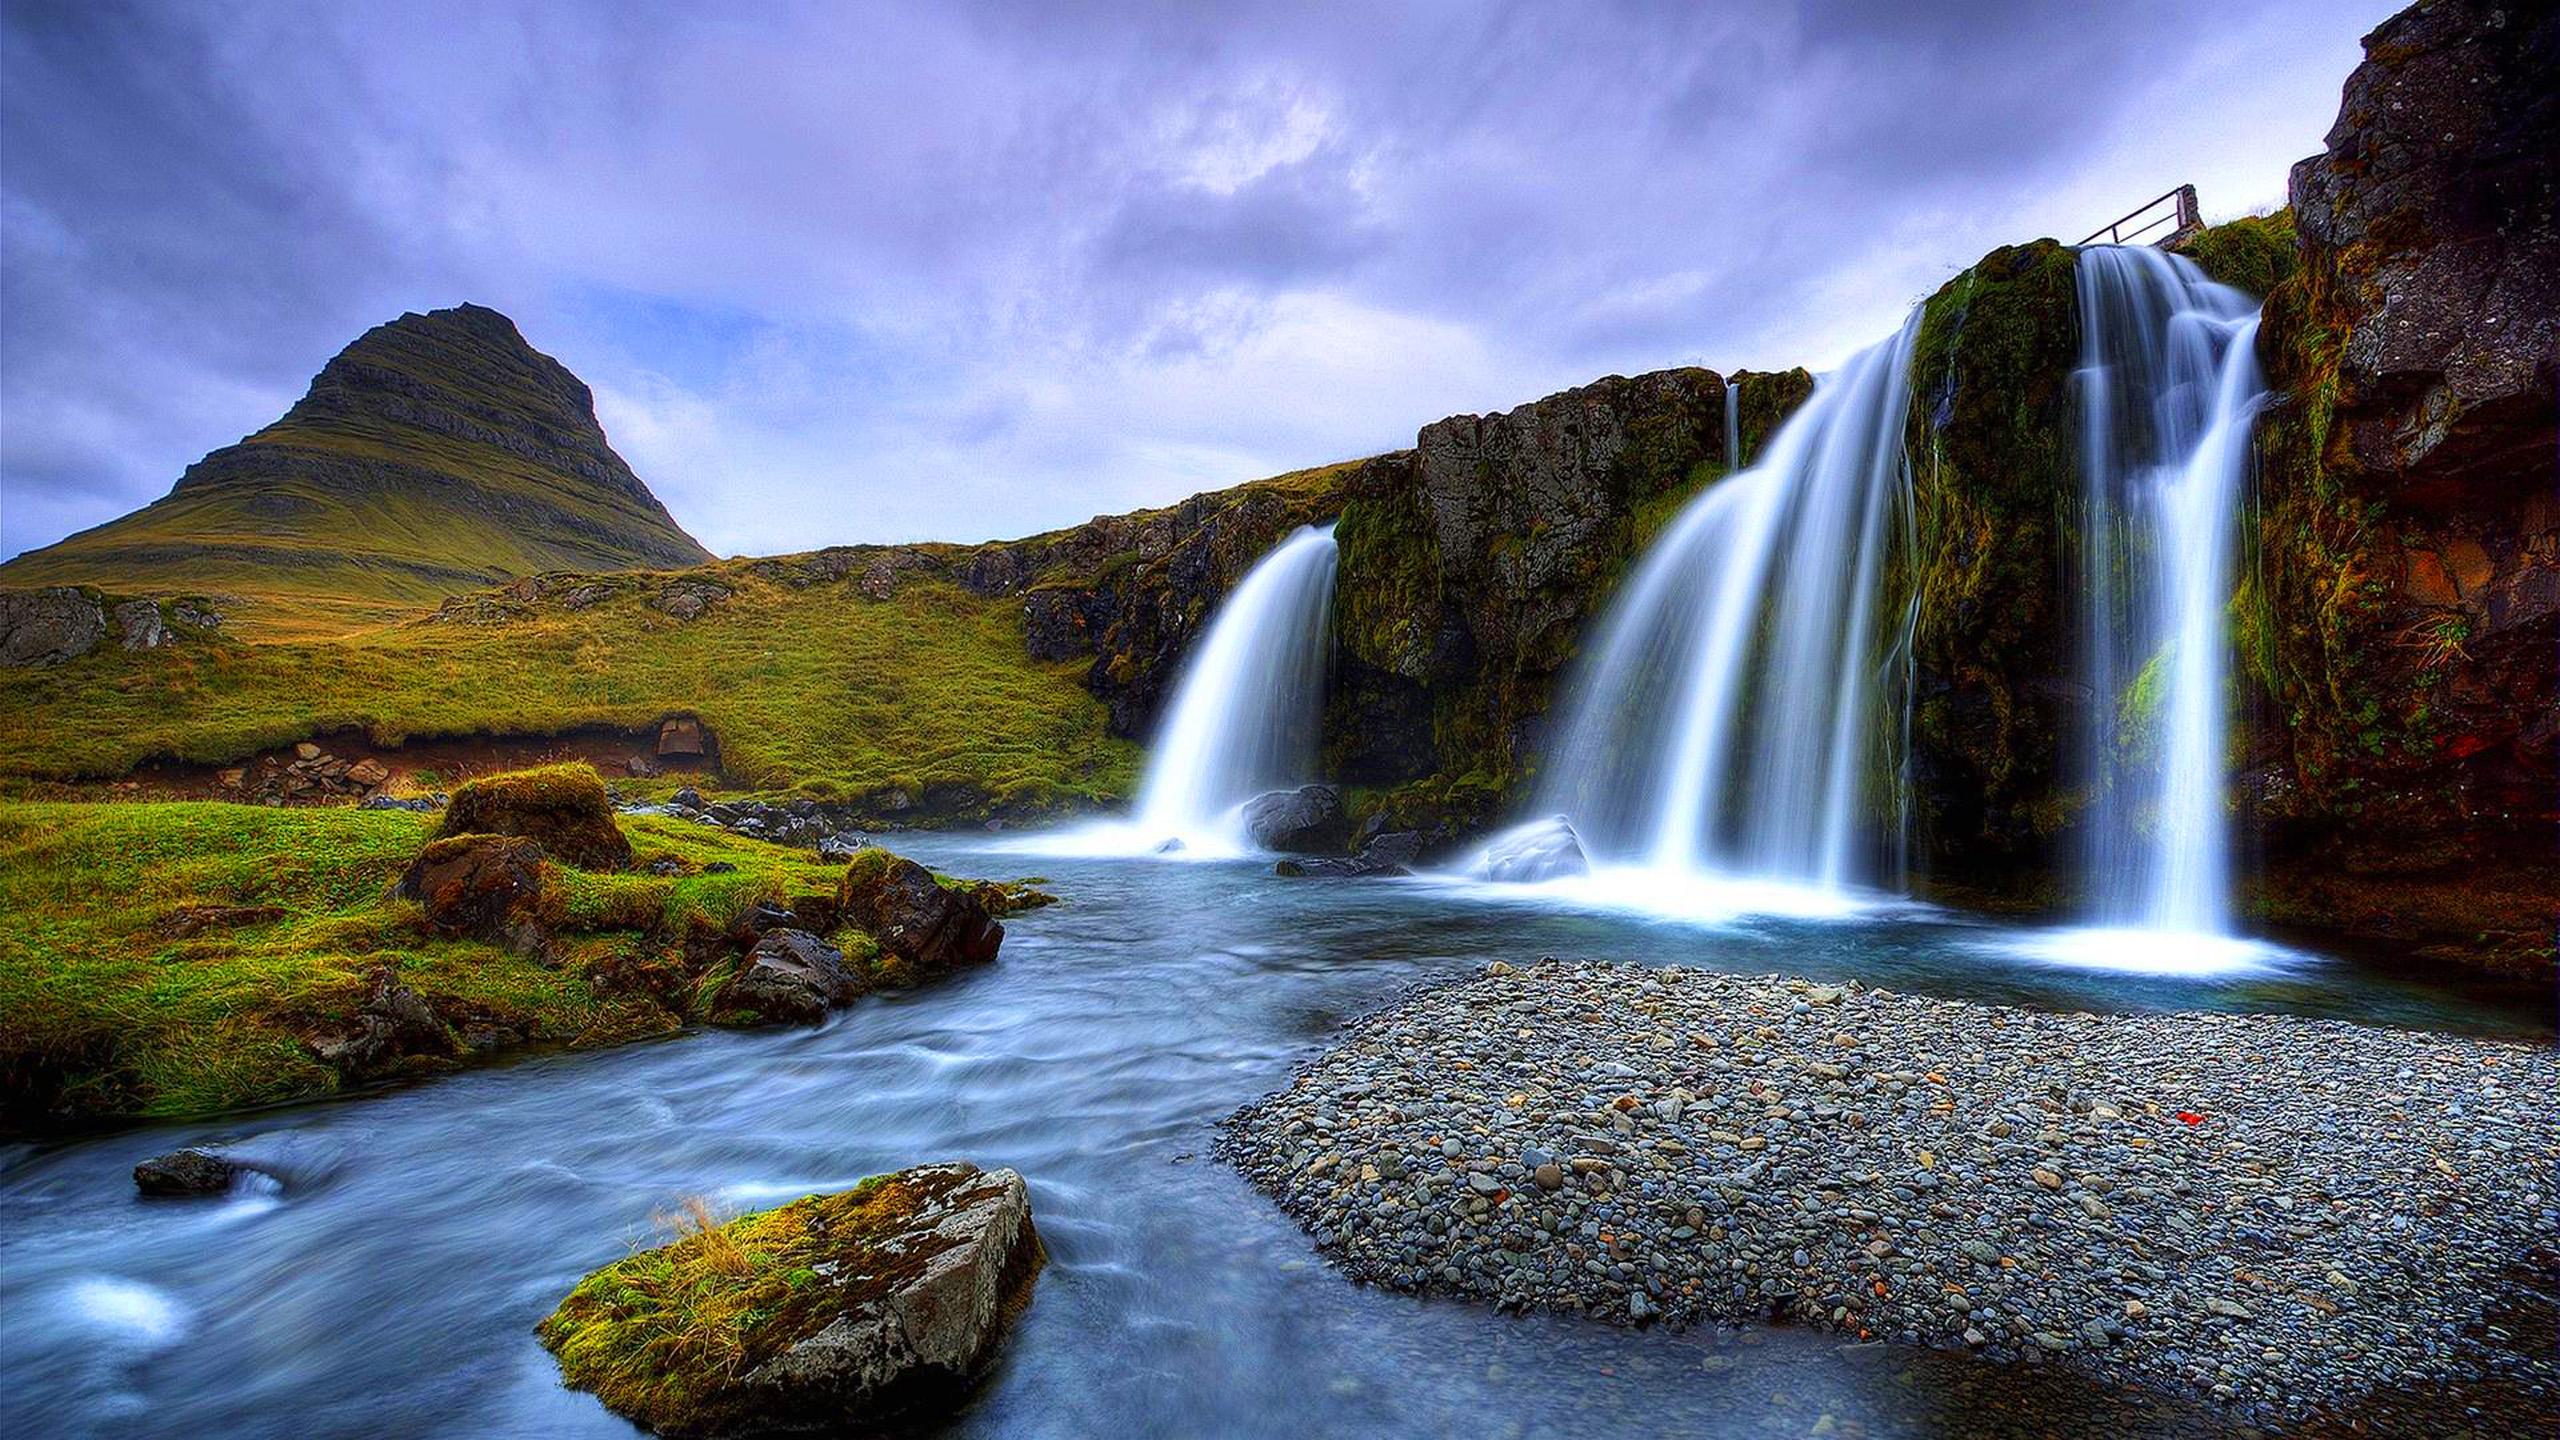 Scenery Waterfall Wallpaper 4k 2560x1440 Download Hd Wallpaper Wallpapertip